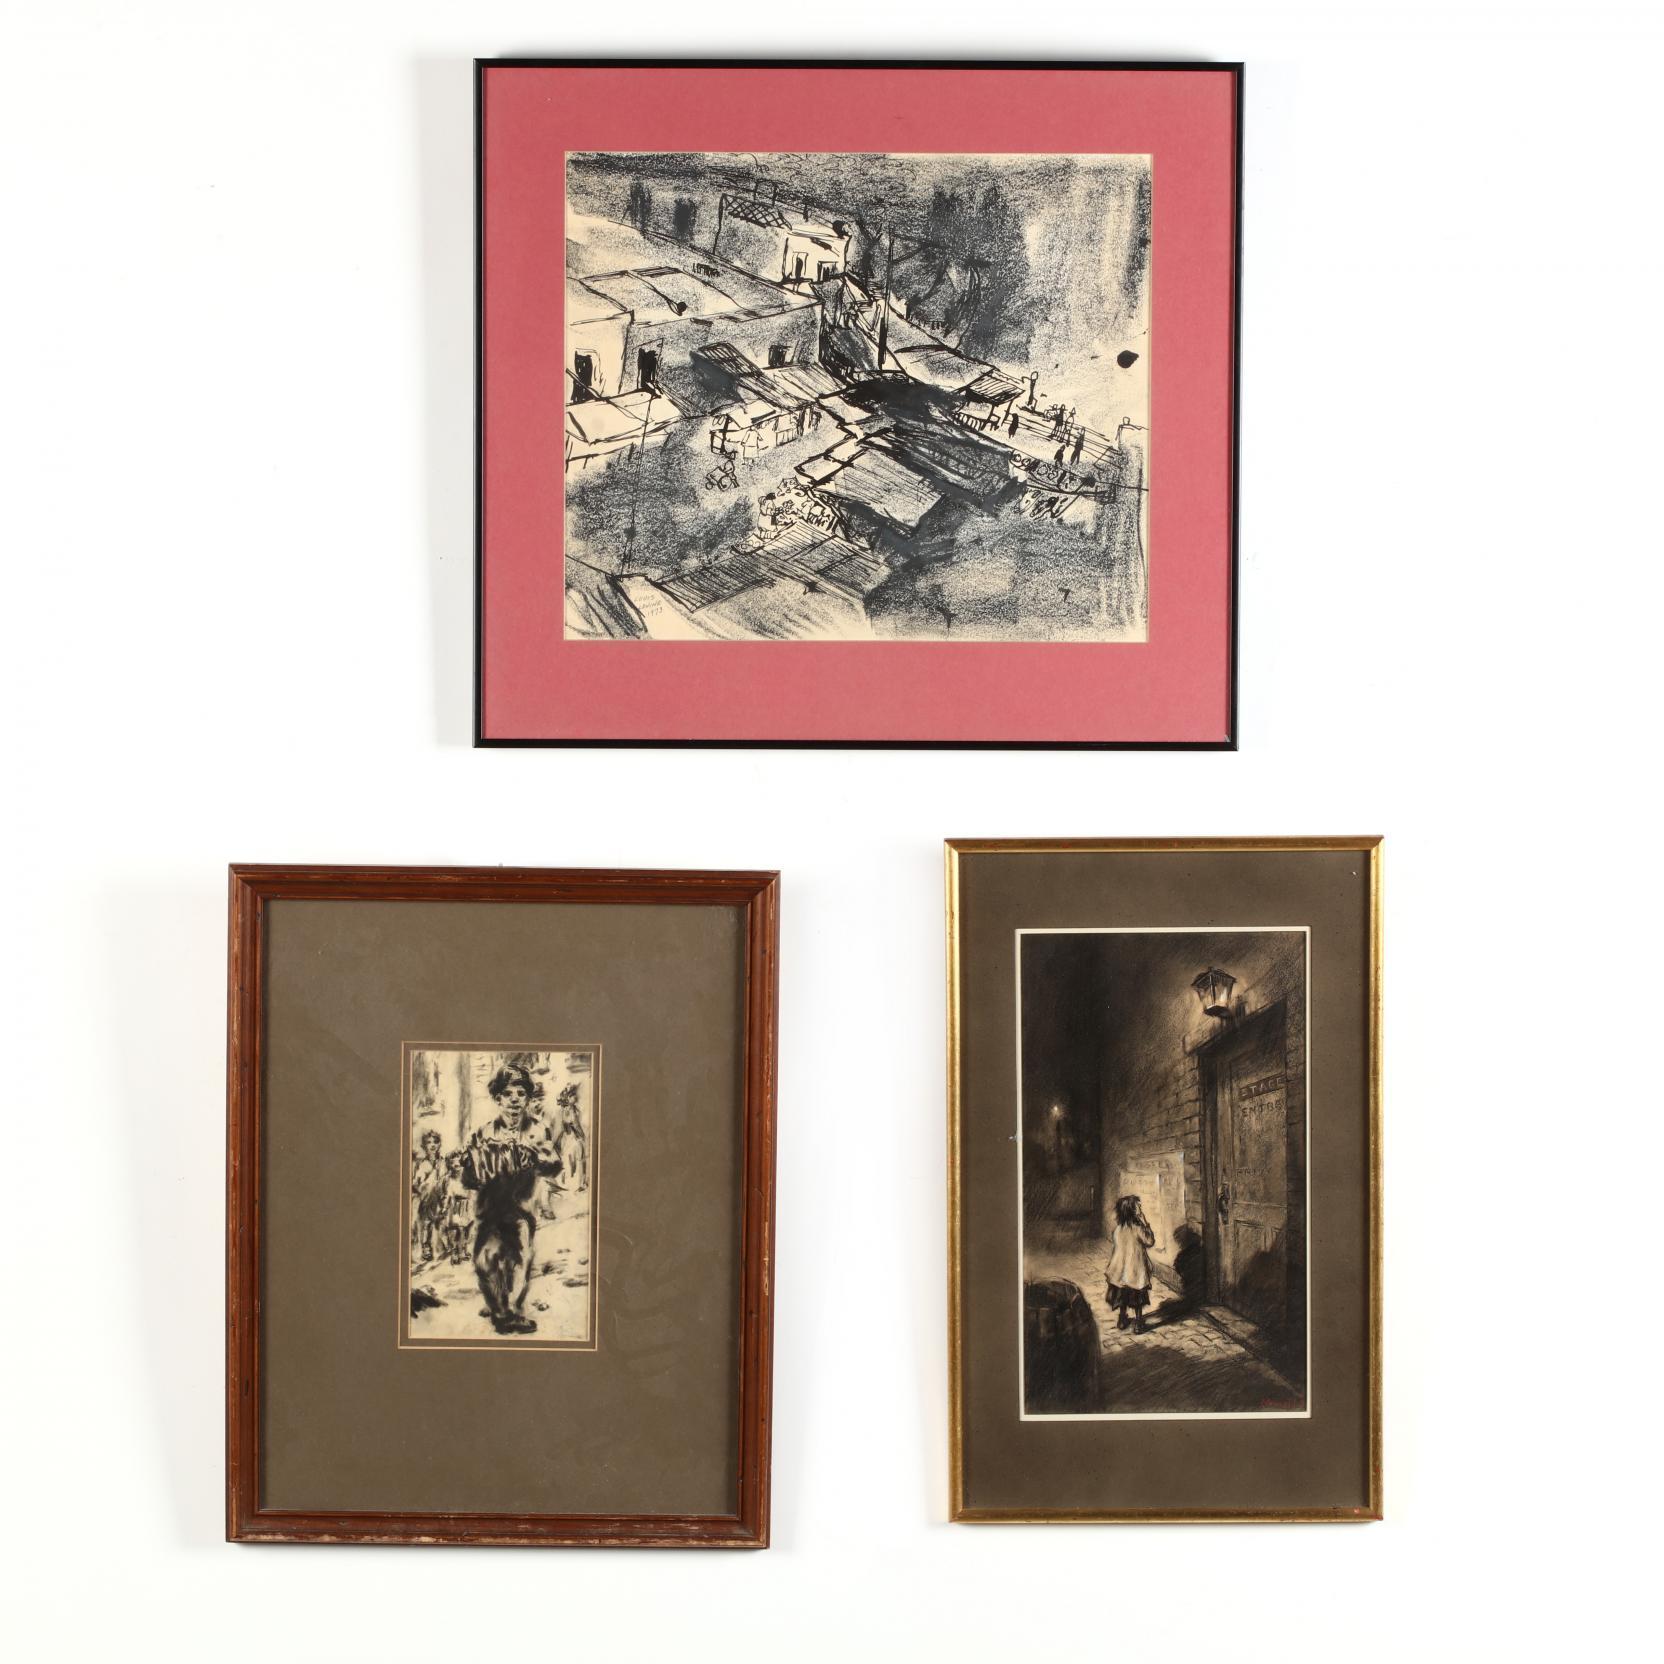 three-black-white-sketches-of-street-scenes-in-new-york-and-philadelphia